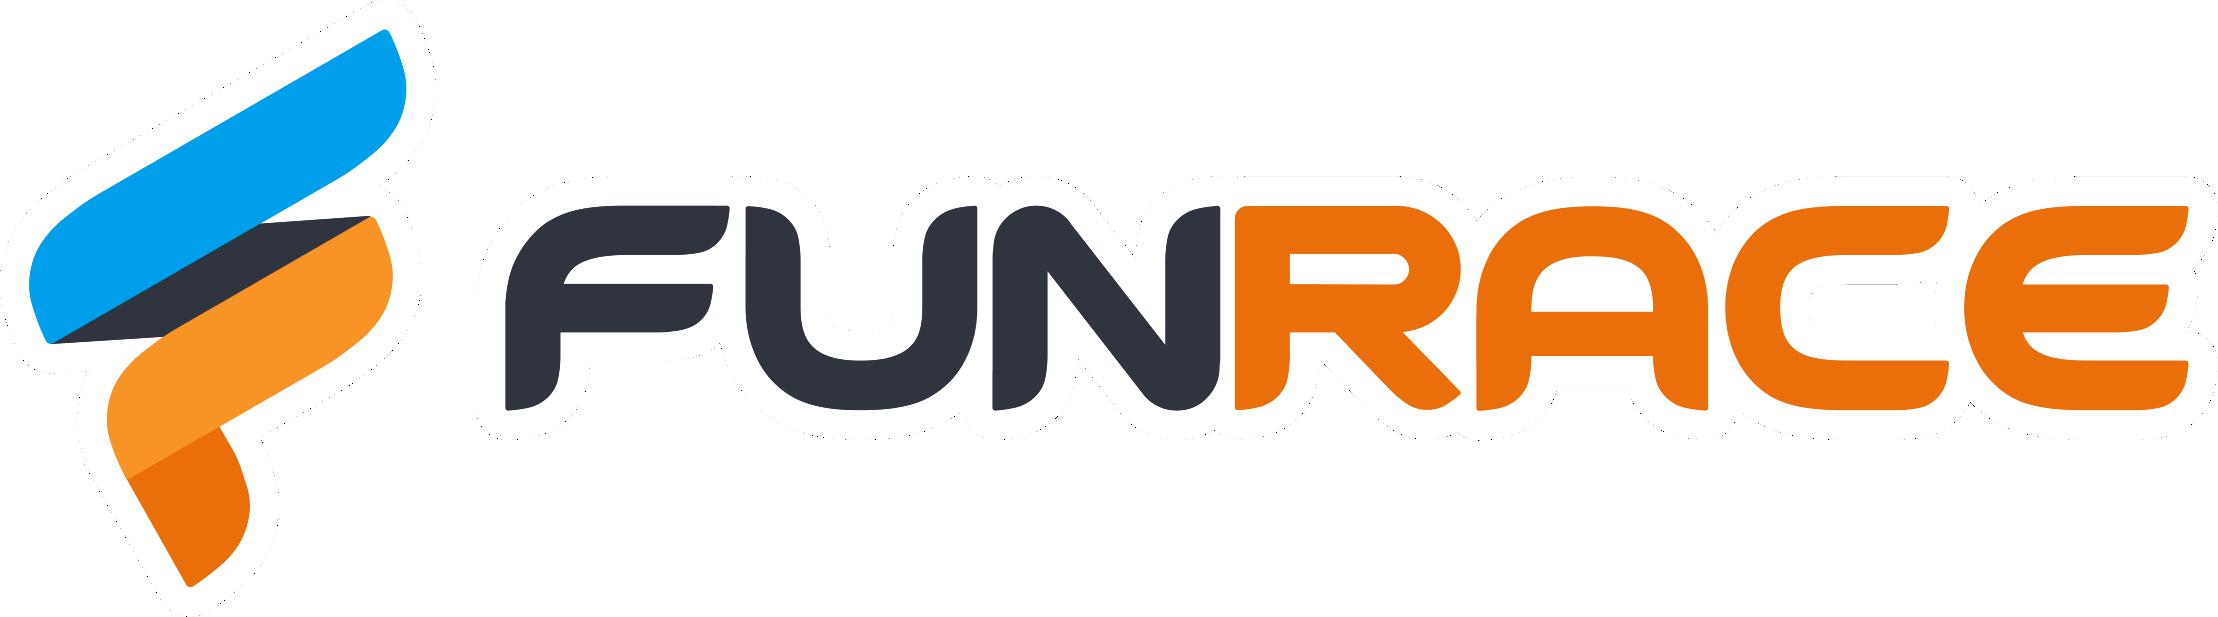 funrace_logo